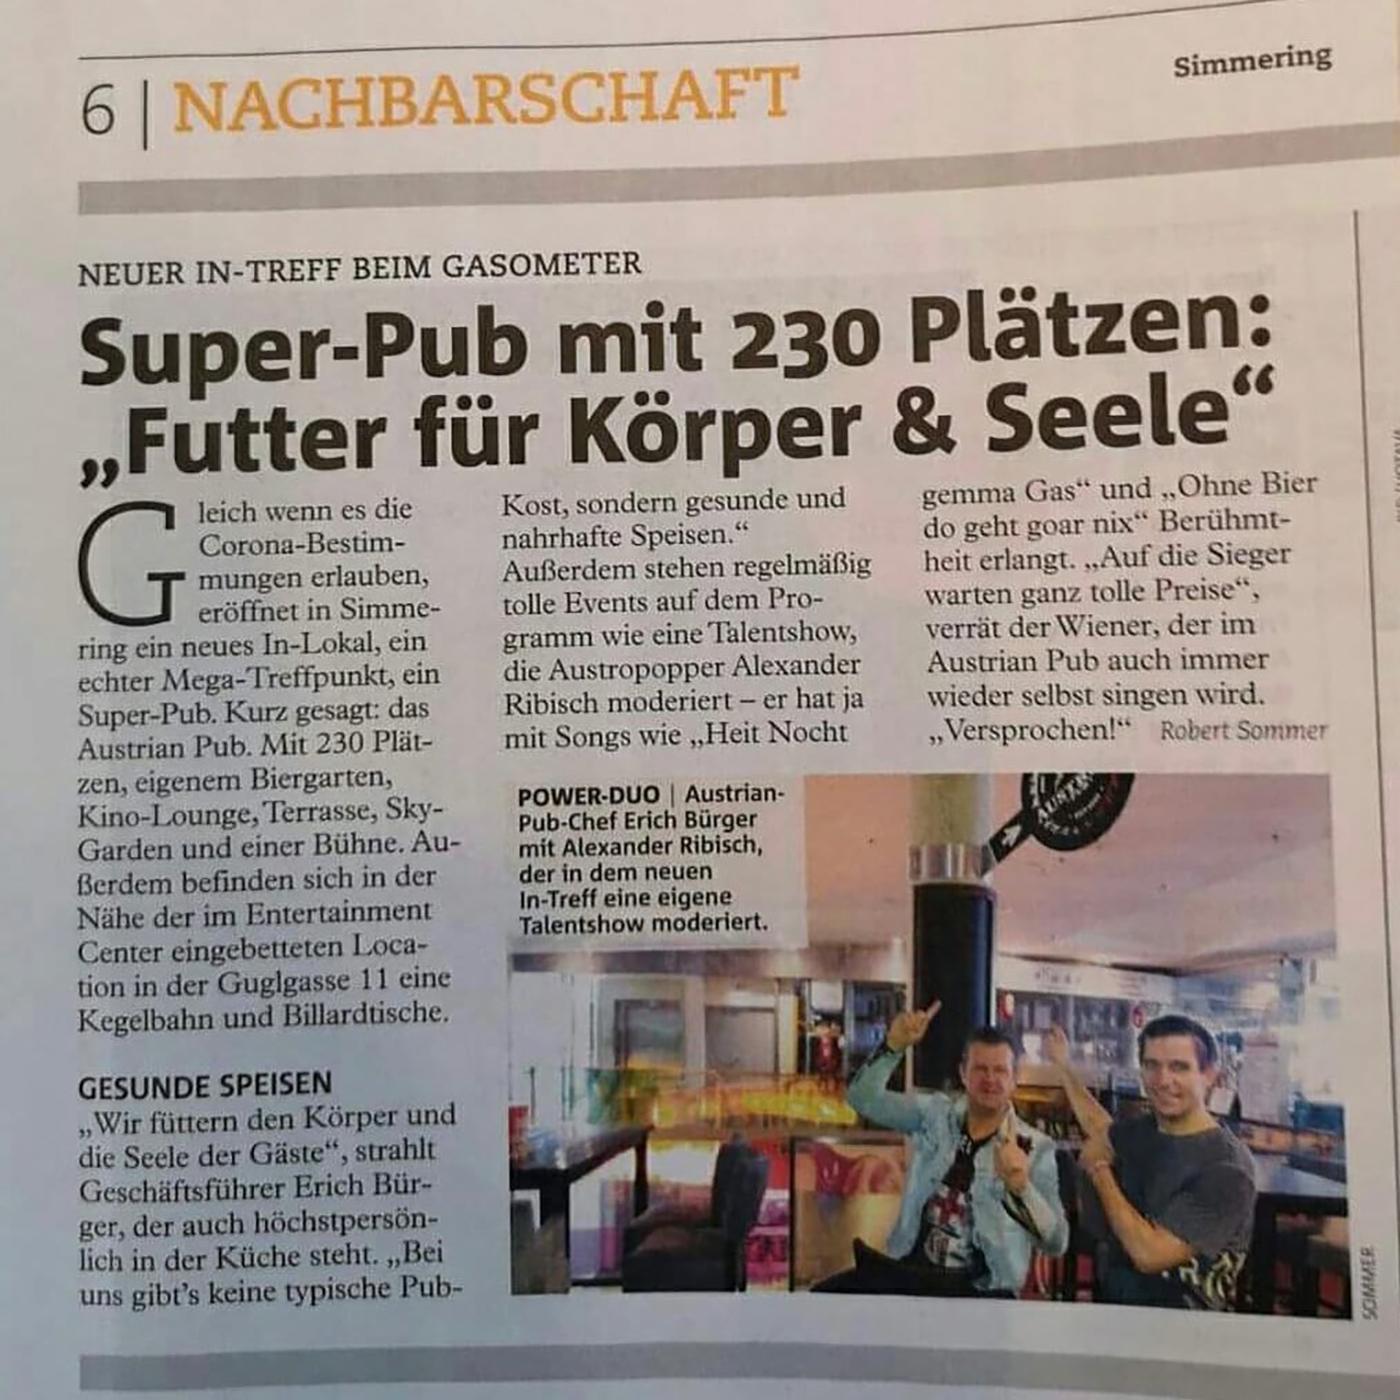 Super-Pub mit 230 Platzen